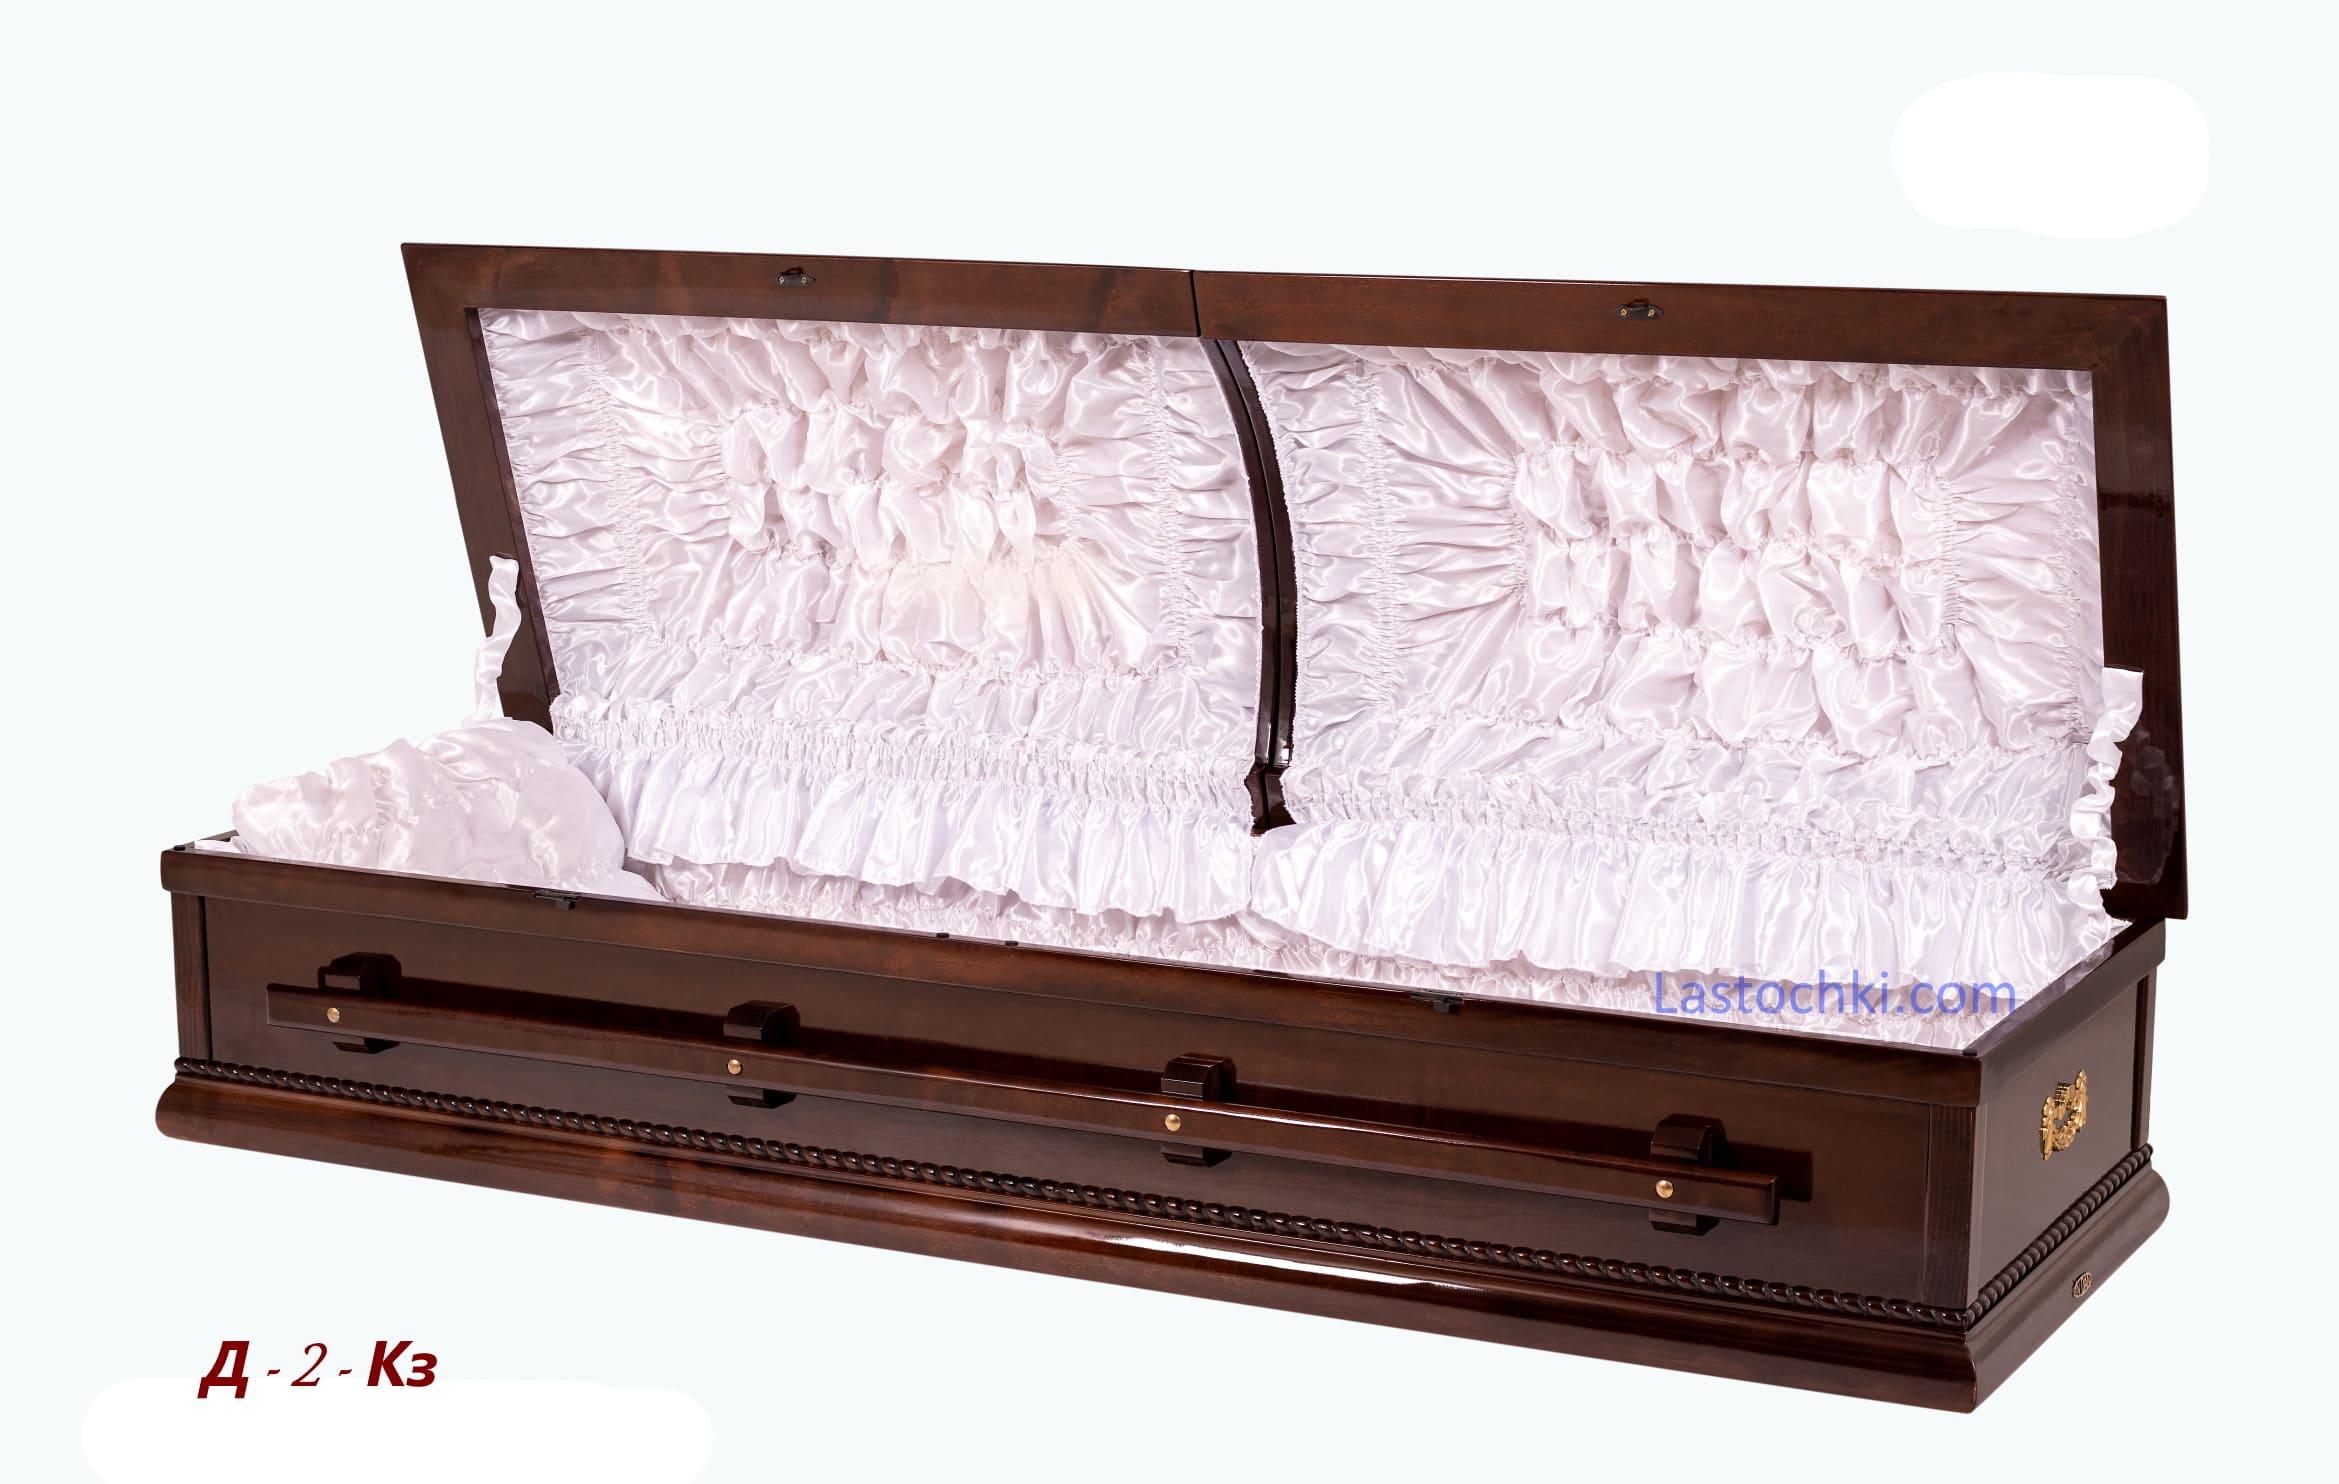 Саркофаг Д -2- К(з)  Цена 21 000 грн.